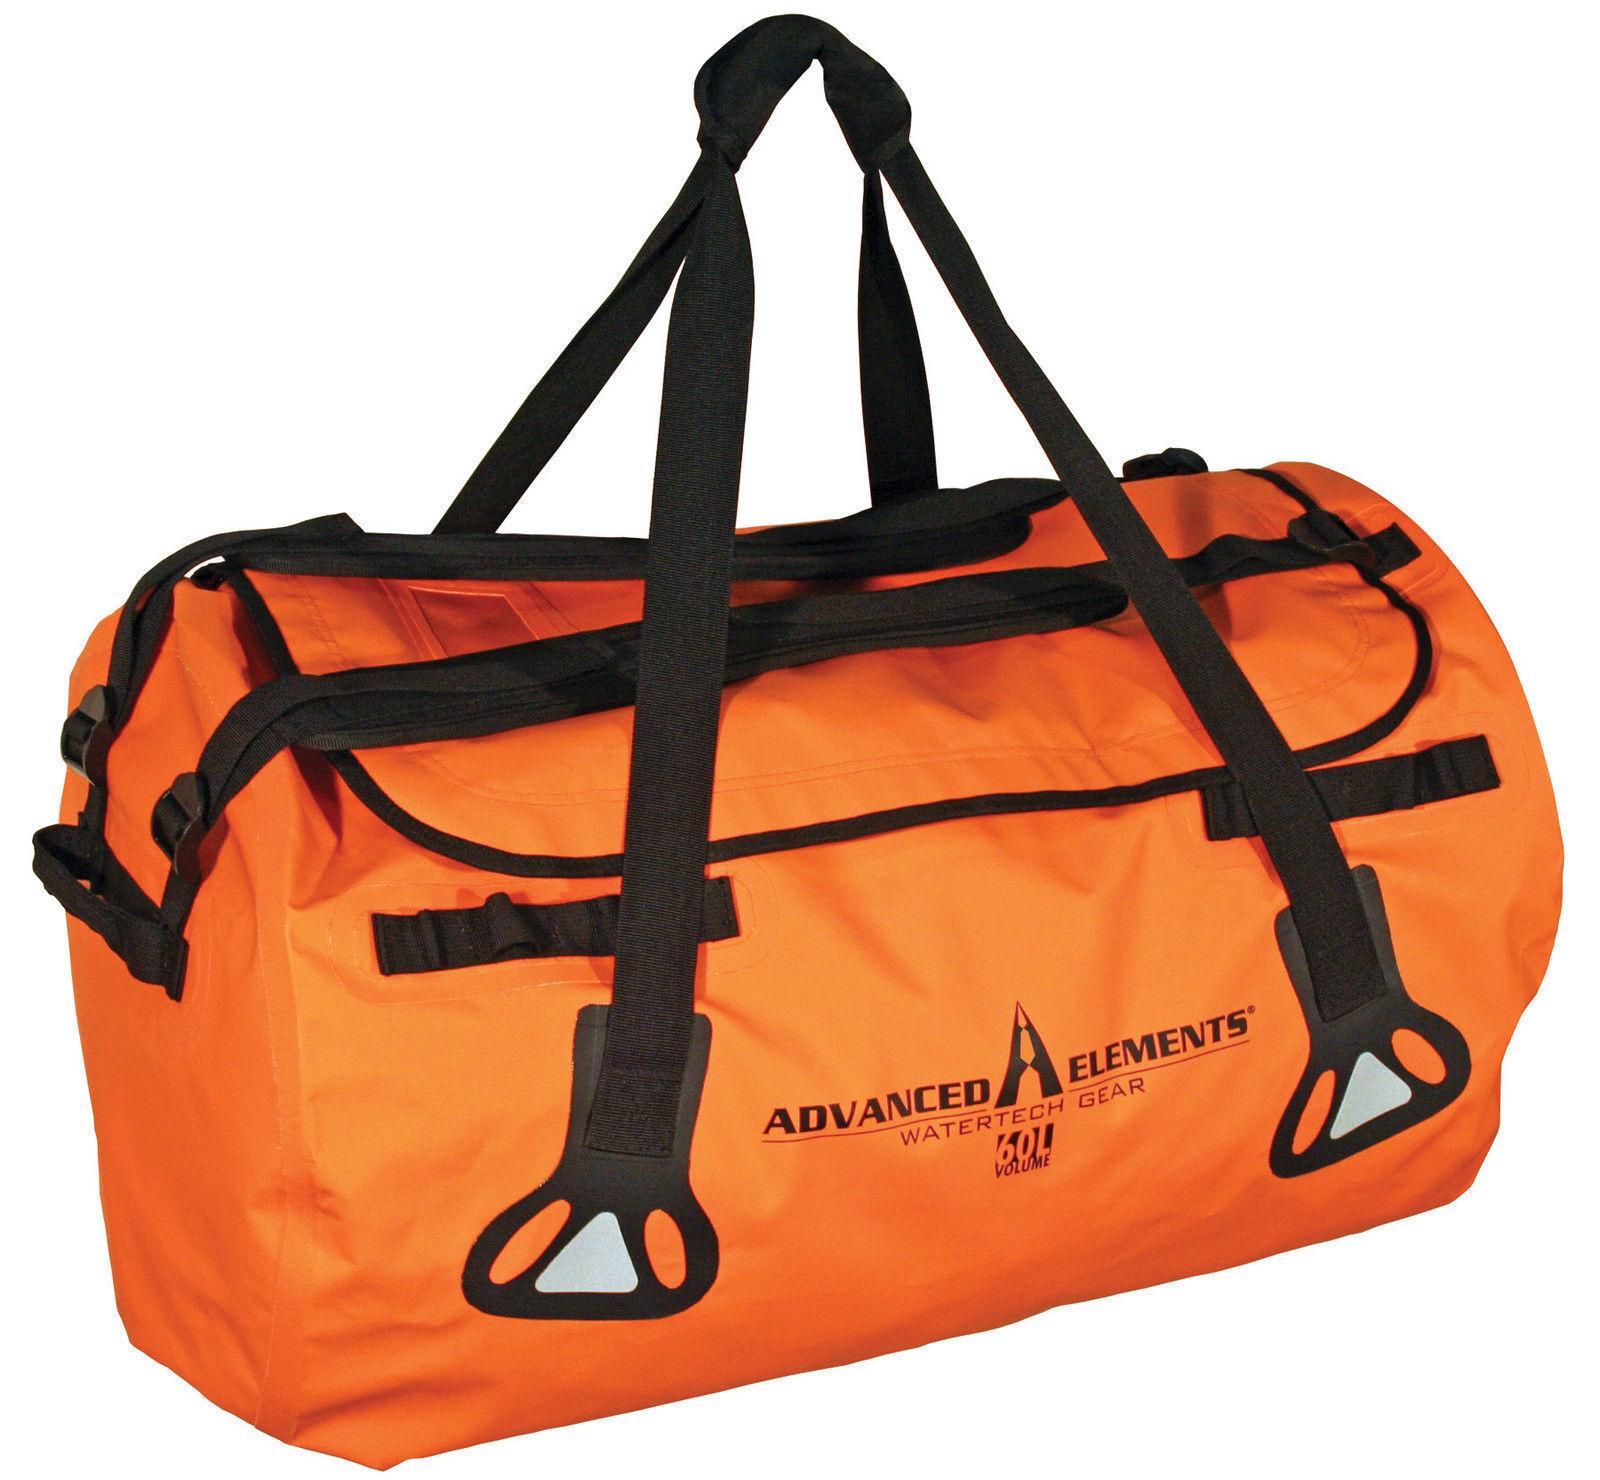 Advanced Elements  Abyss 60L WaterTech Gear Duffel Bag AE3505